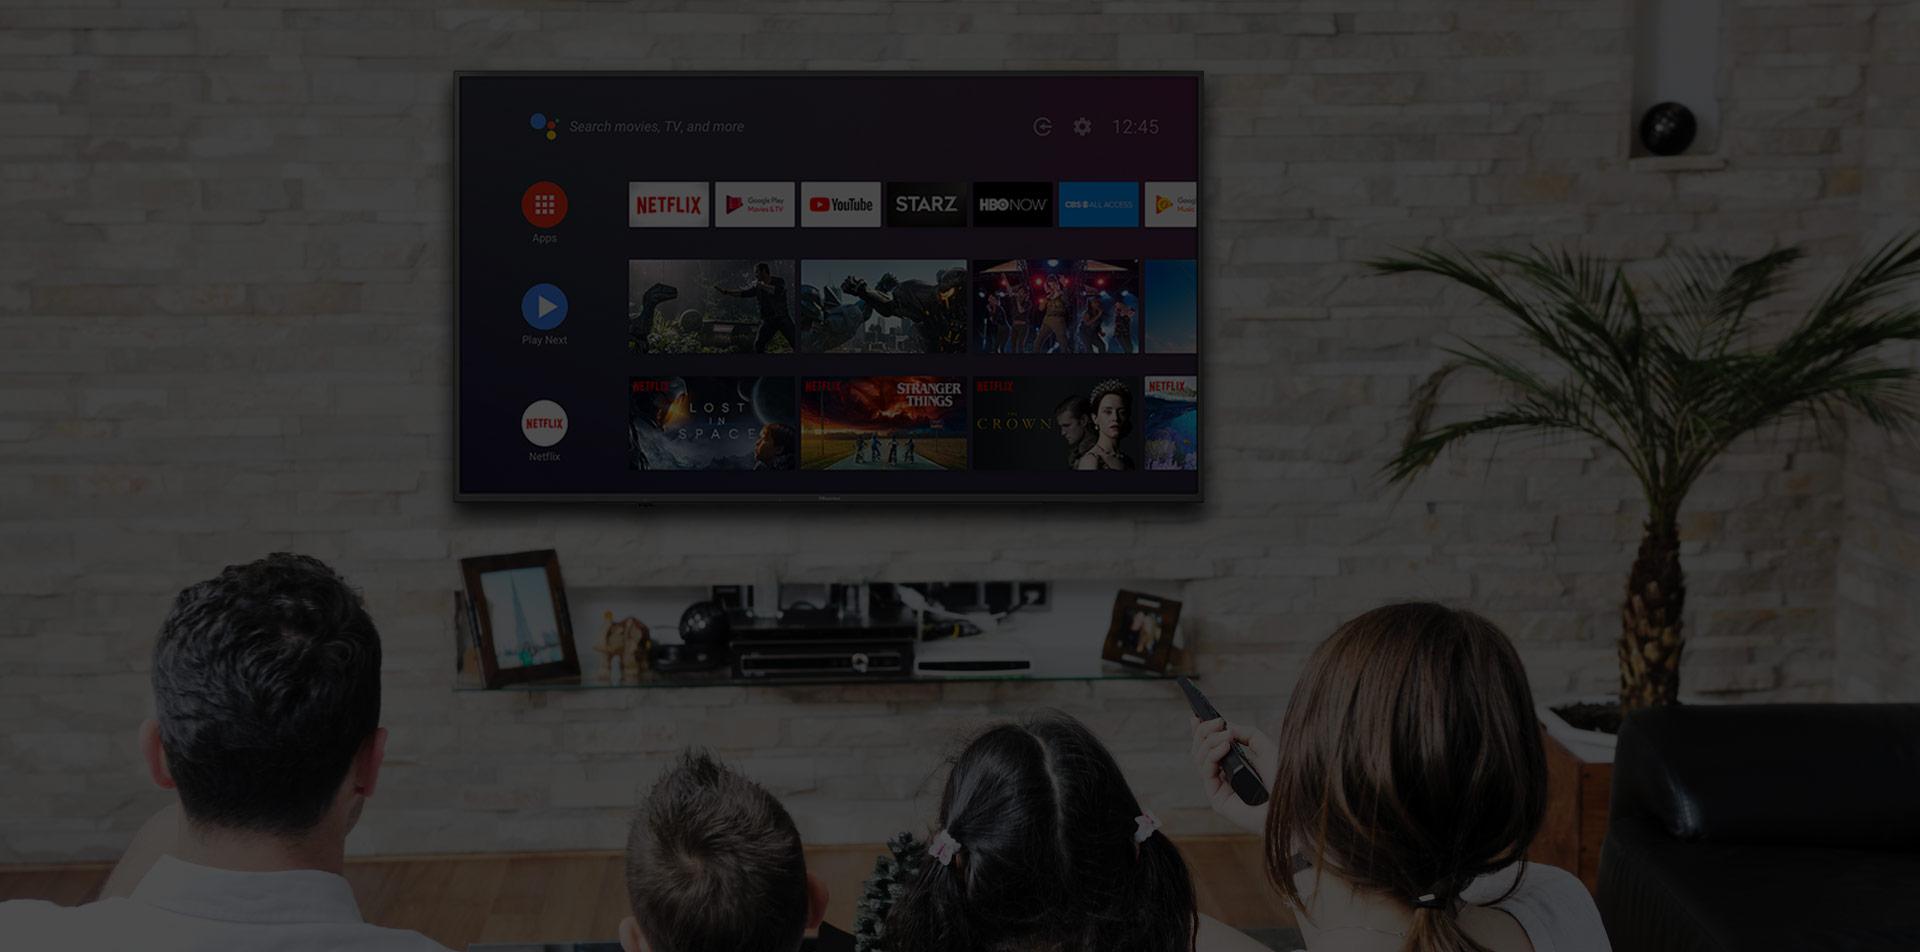 مشکلات رایج تلویزیون Hisense